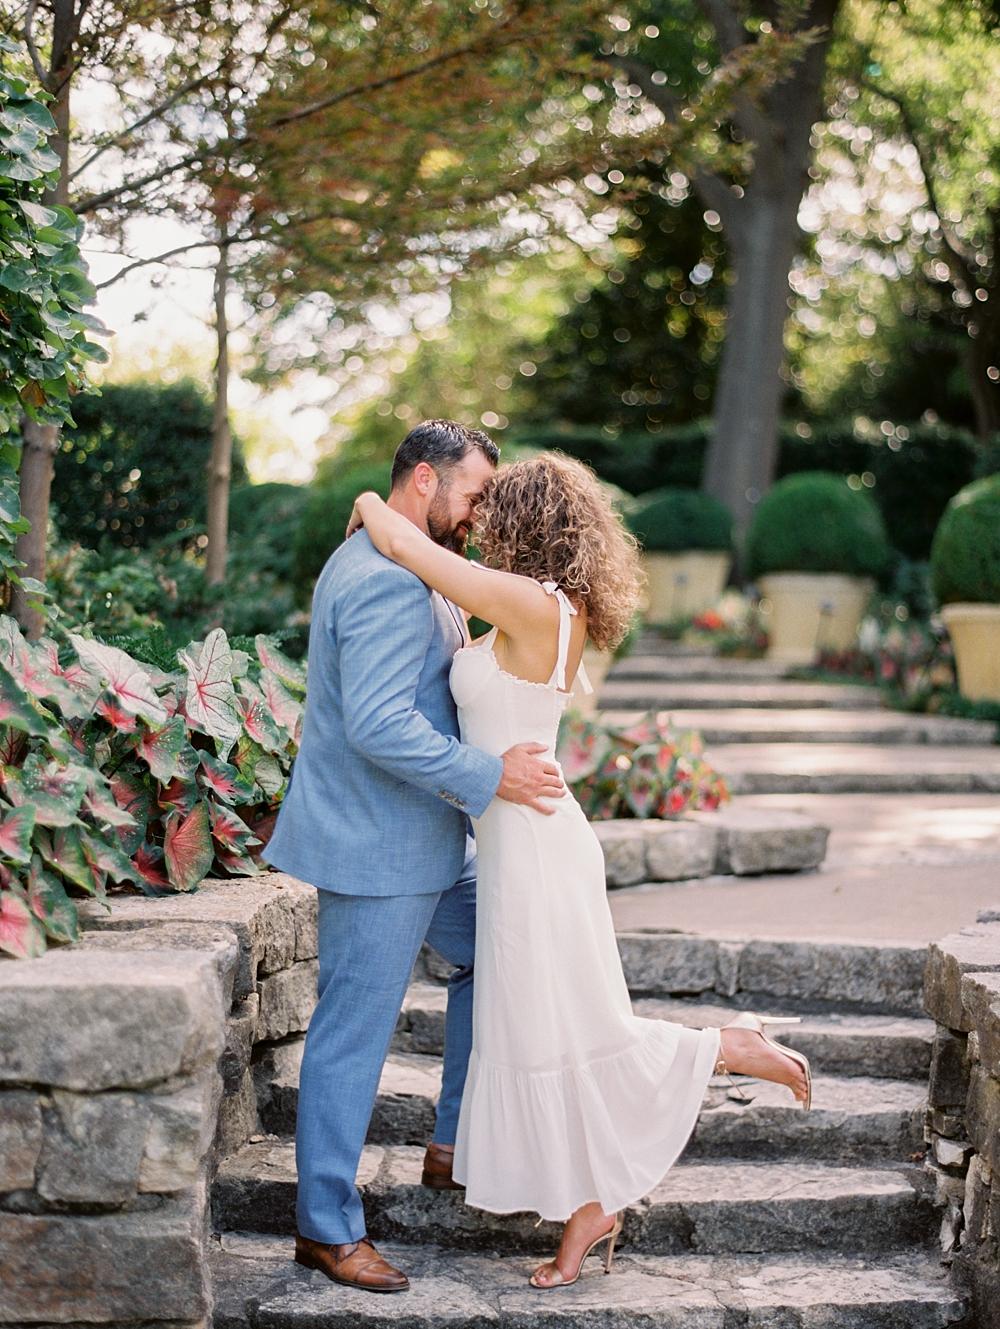 kristin-la-voie-photography-Dallas-Botanical-Garden-Arboretum-Engagement-fine-art-wedding-photographer-74